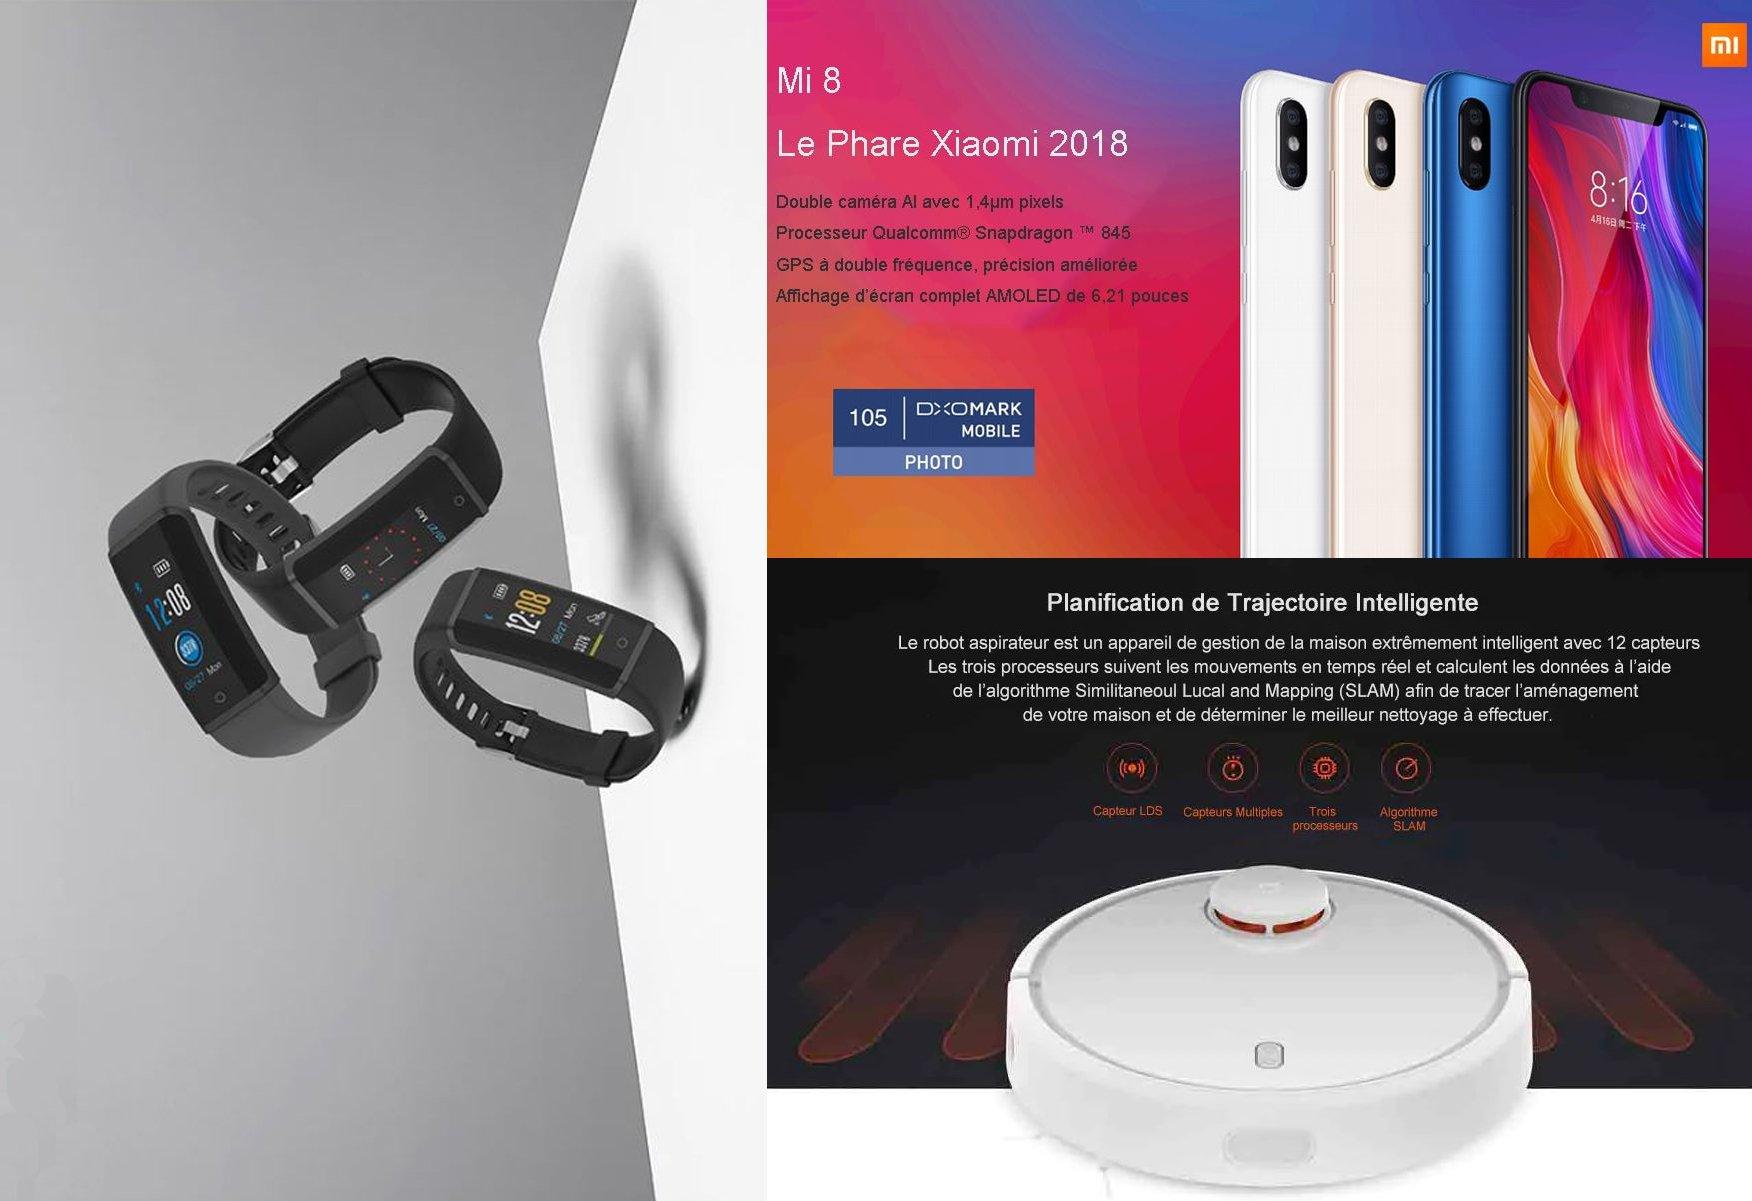 Offres du jour: Xiaomi Mi 8 Lite 204 €, Aspirateur Robot Xiaomi Mi 243 Euros et bracelet Lenovo HX03F 17 €